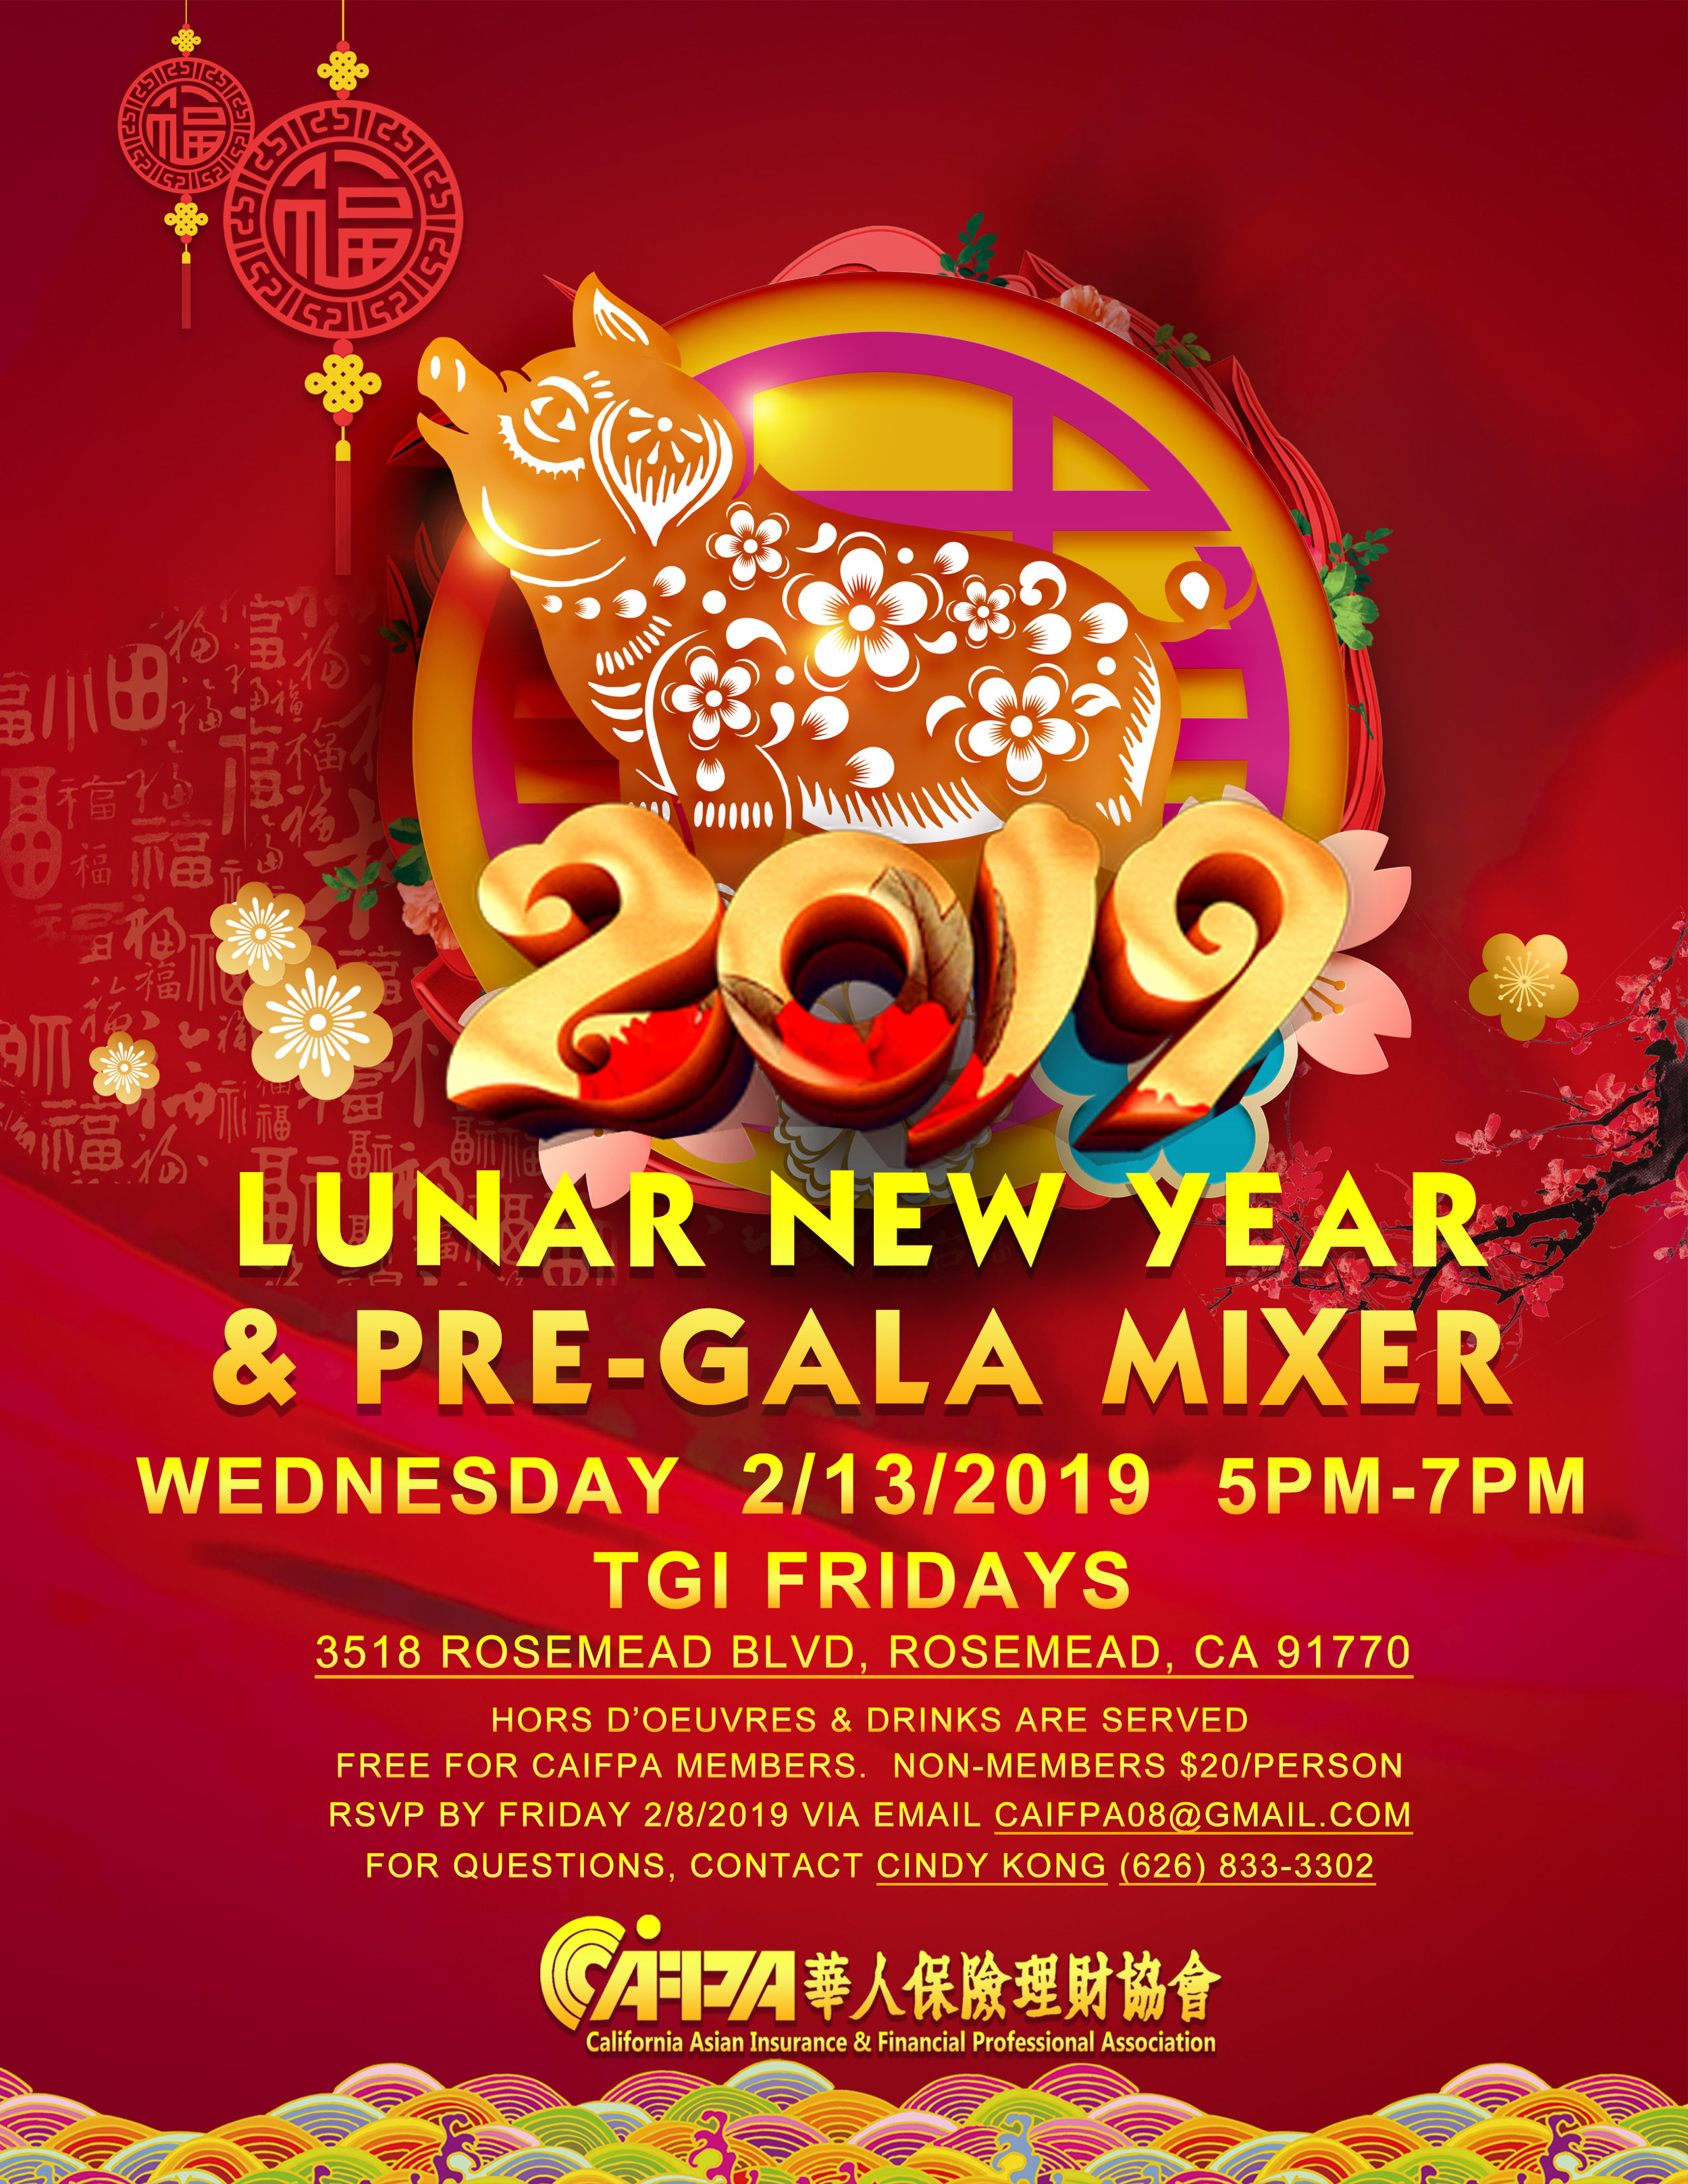 CAIFPA Lunar new year & pre-gala mixer - February 13th, 2019